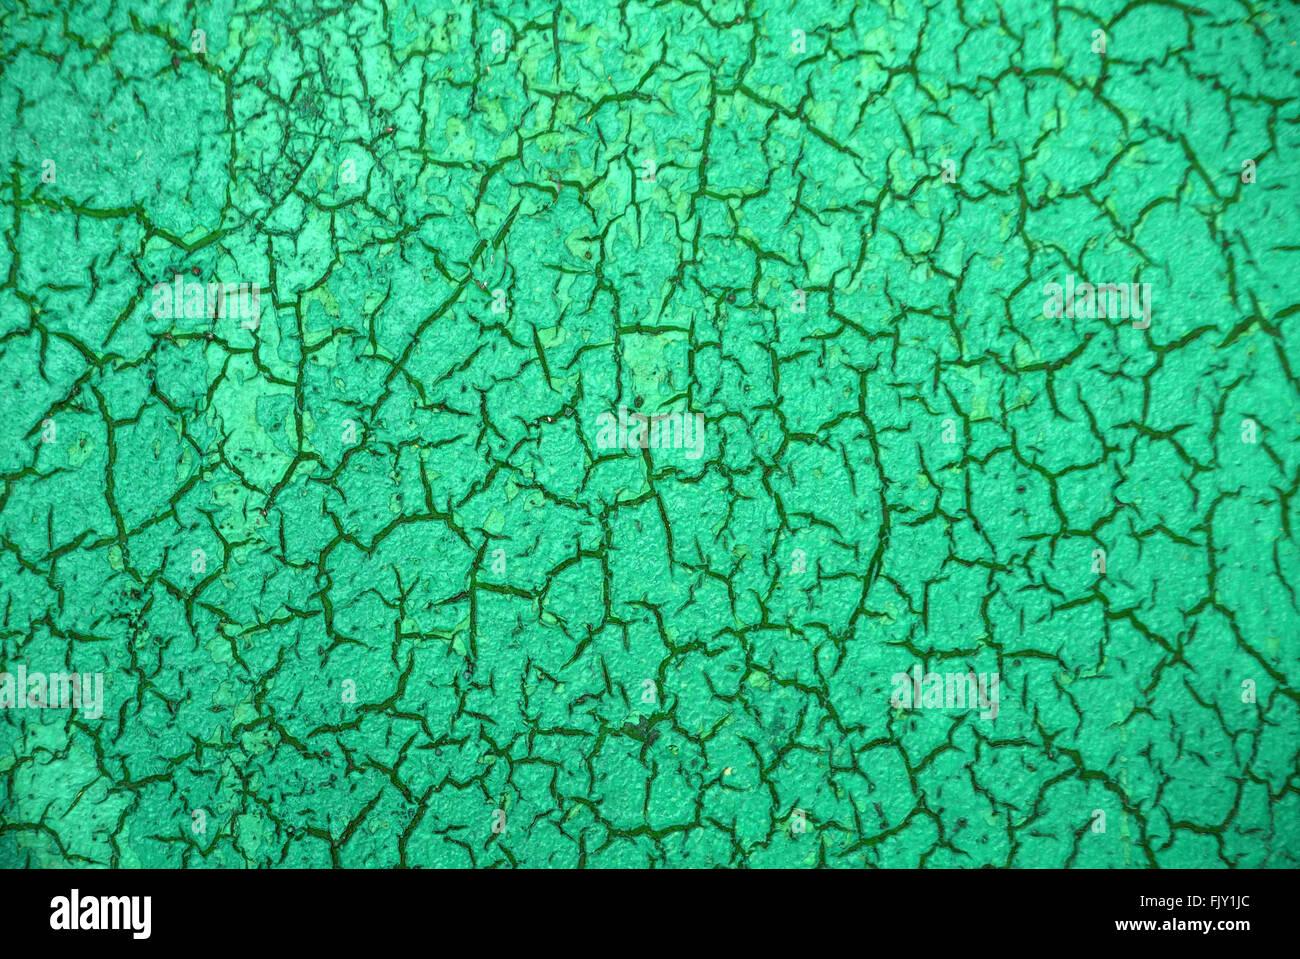 Disparo de fotograma completo de pared con textura verde Imagen De Stock